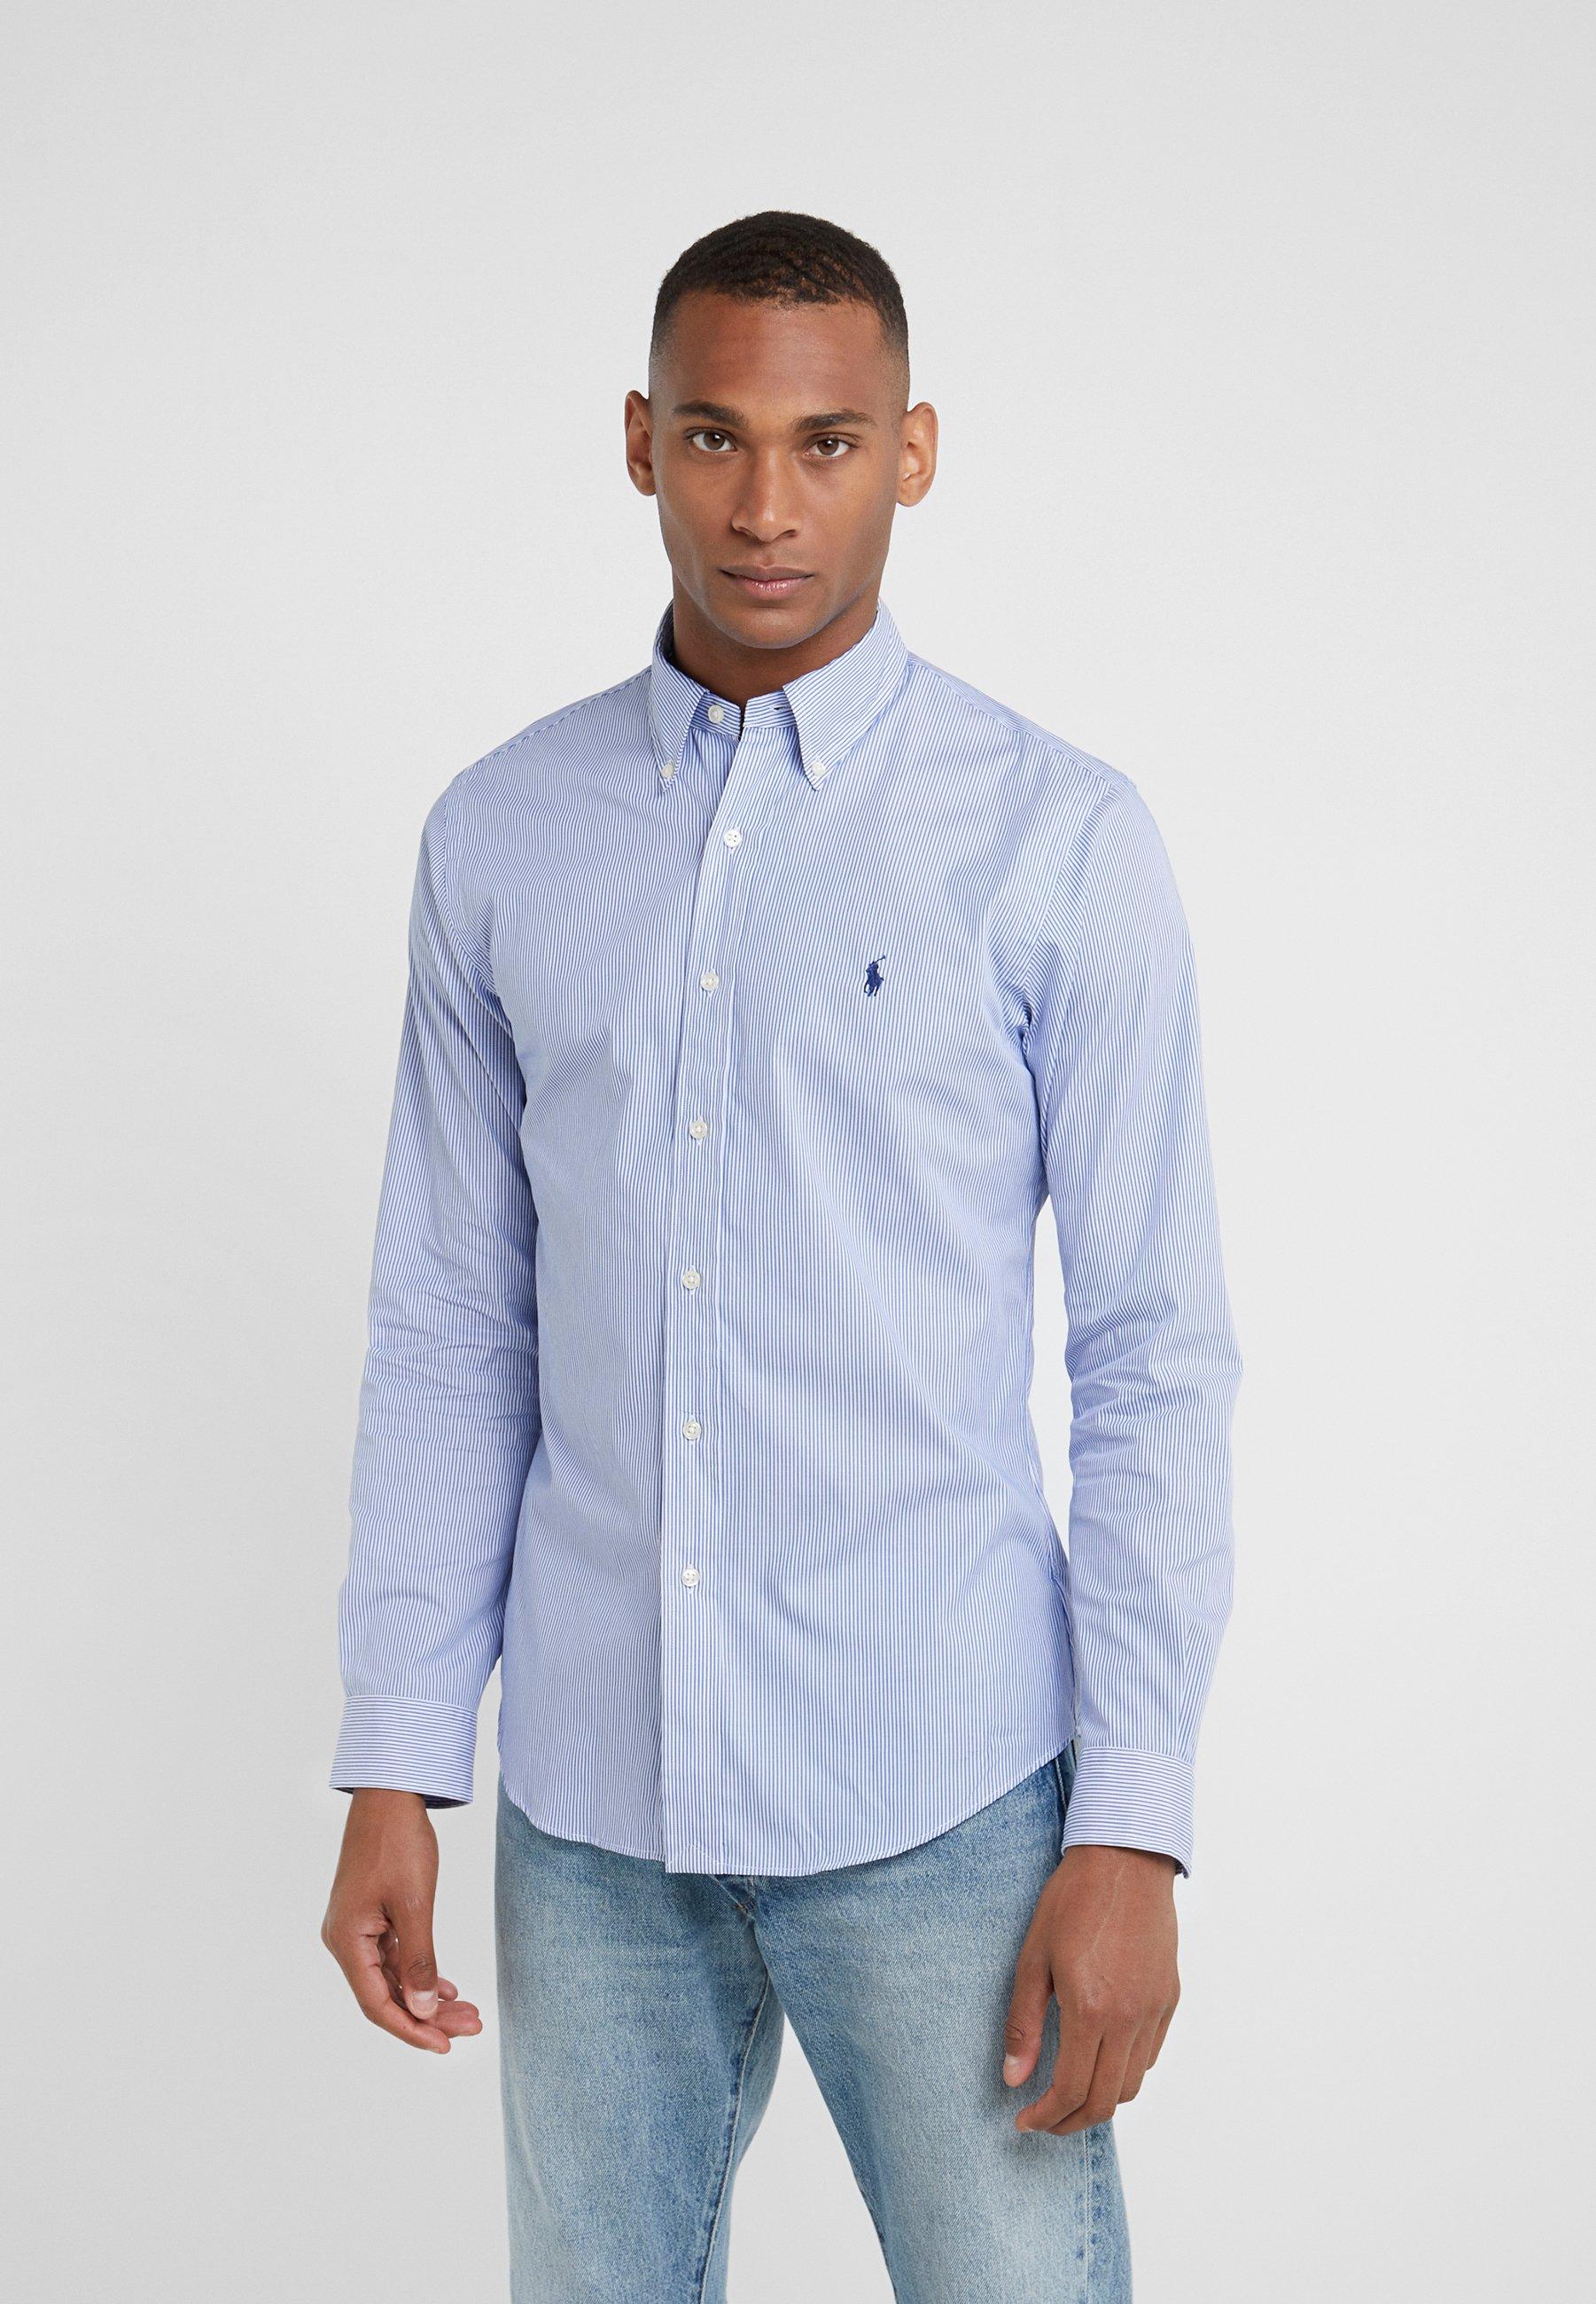 Polo Ralph Lauren Natural Slim Fit Overhemd Blue White Blauw Zalando Nl